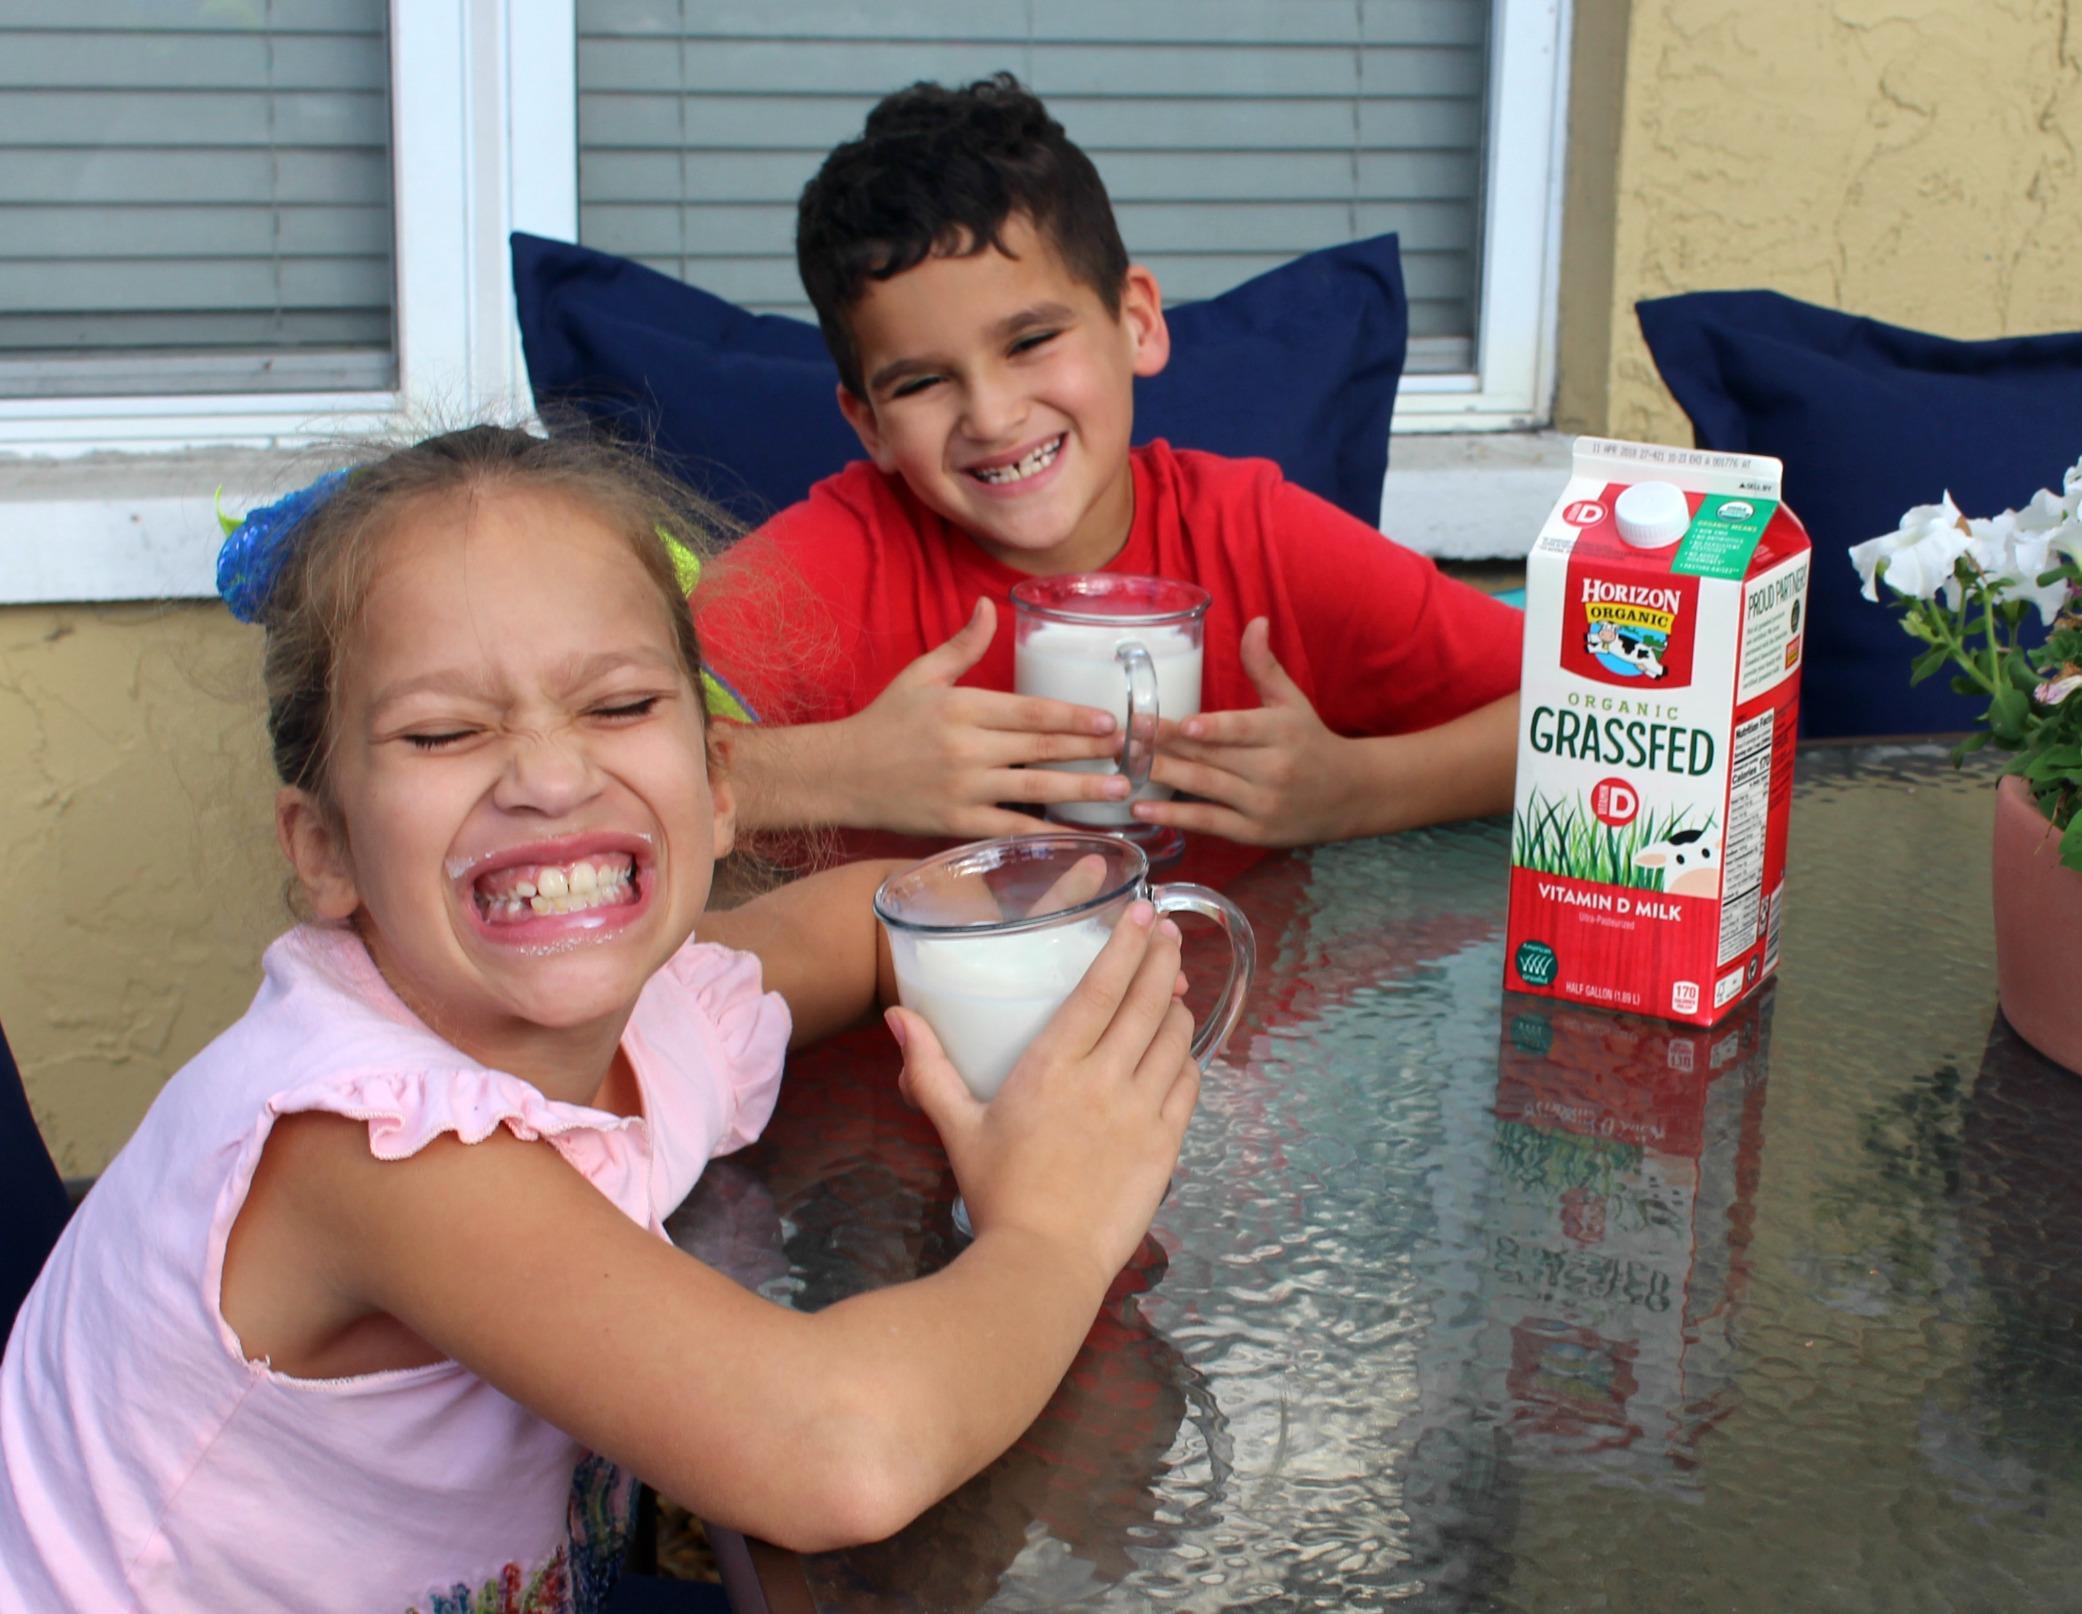 Organic-grassfed-horizon-milk-walmart-best-milk, stress-free-kids